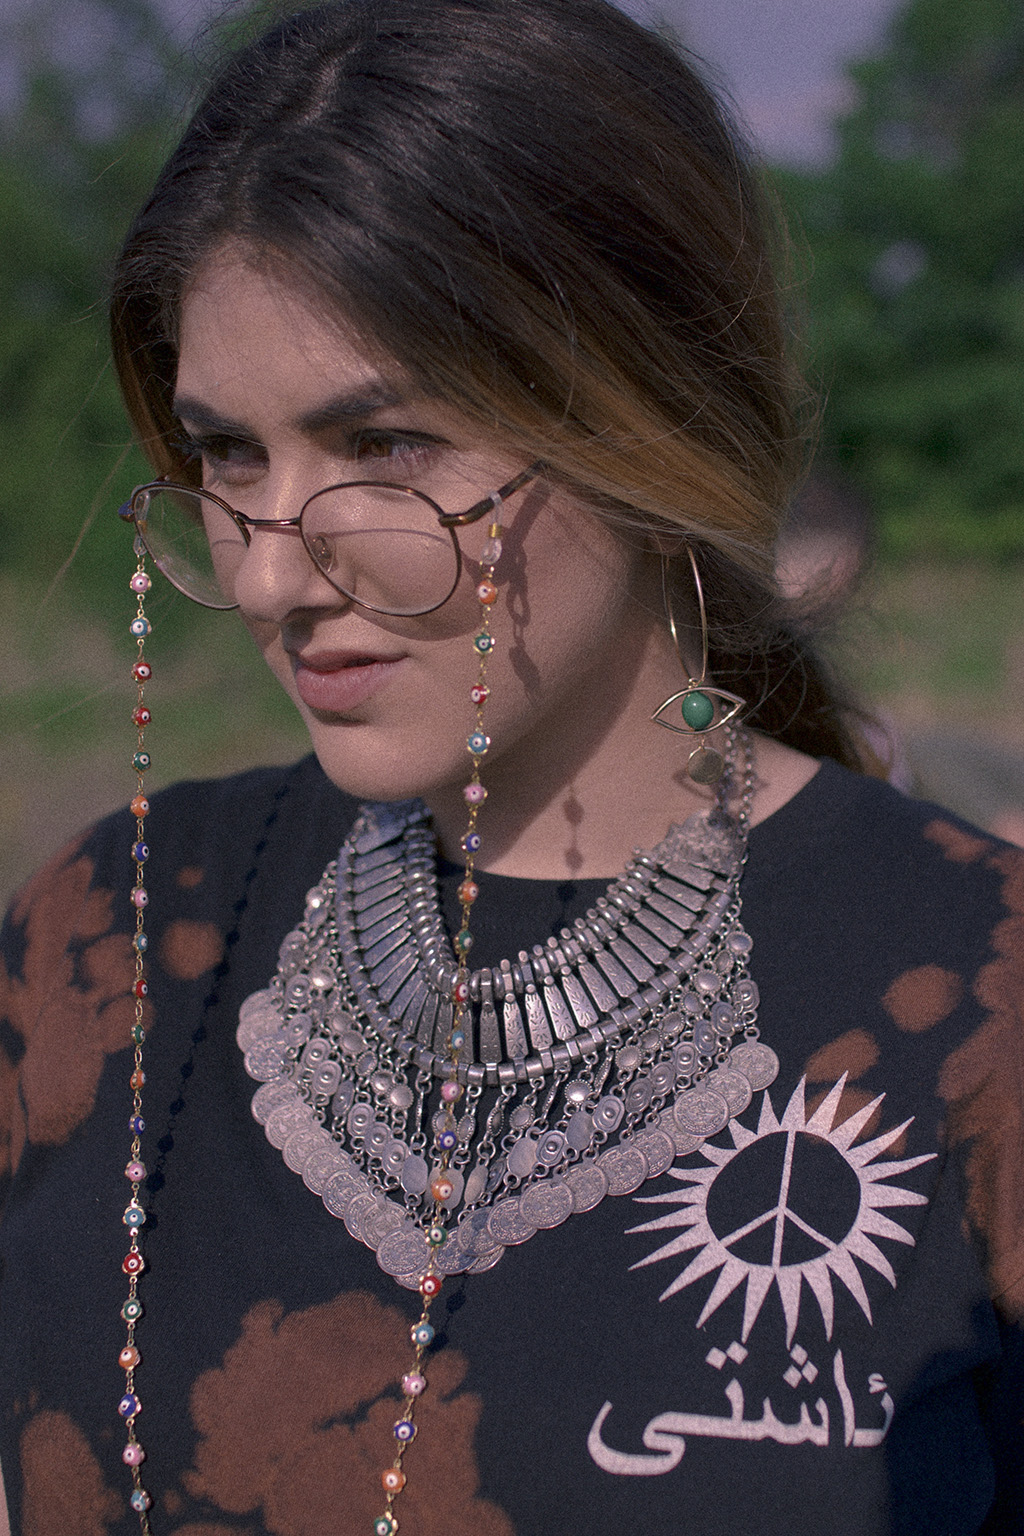 Nuveen Barwari